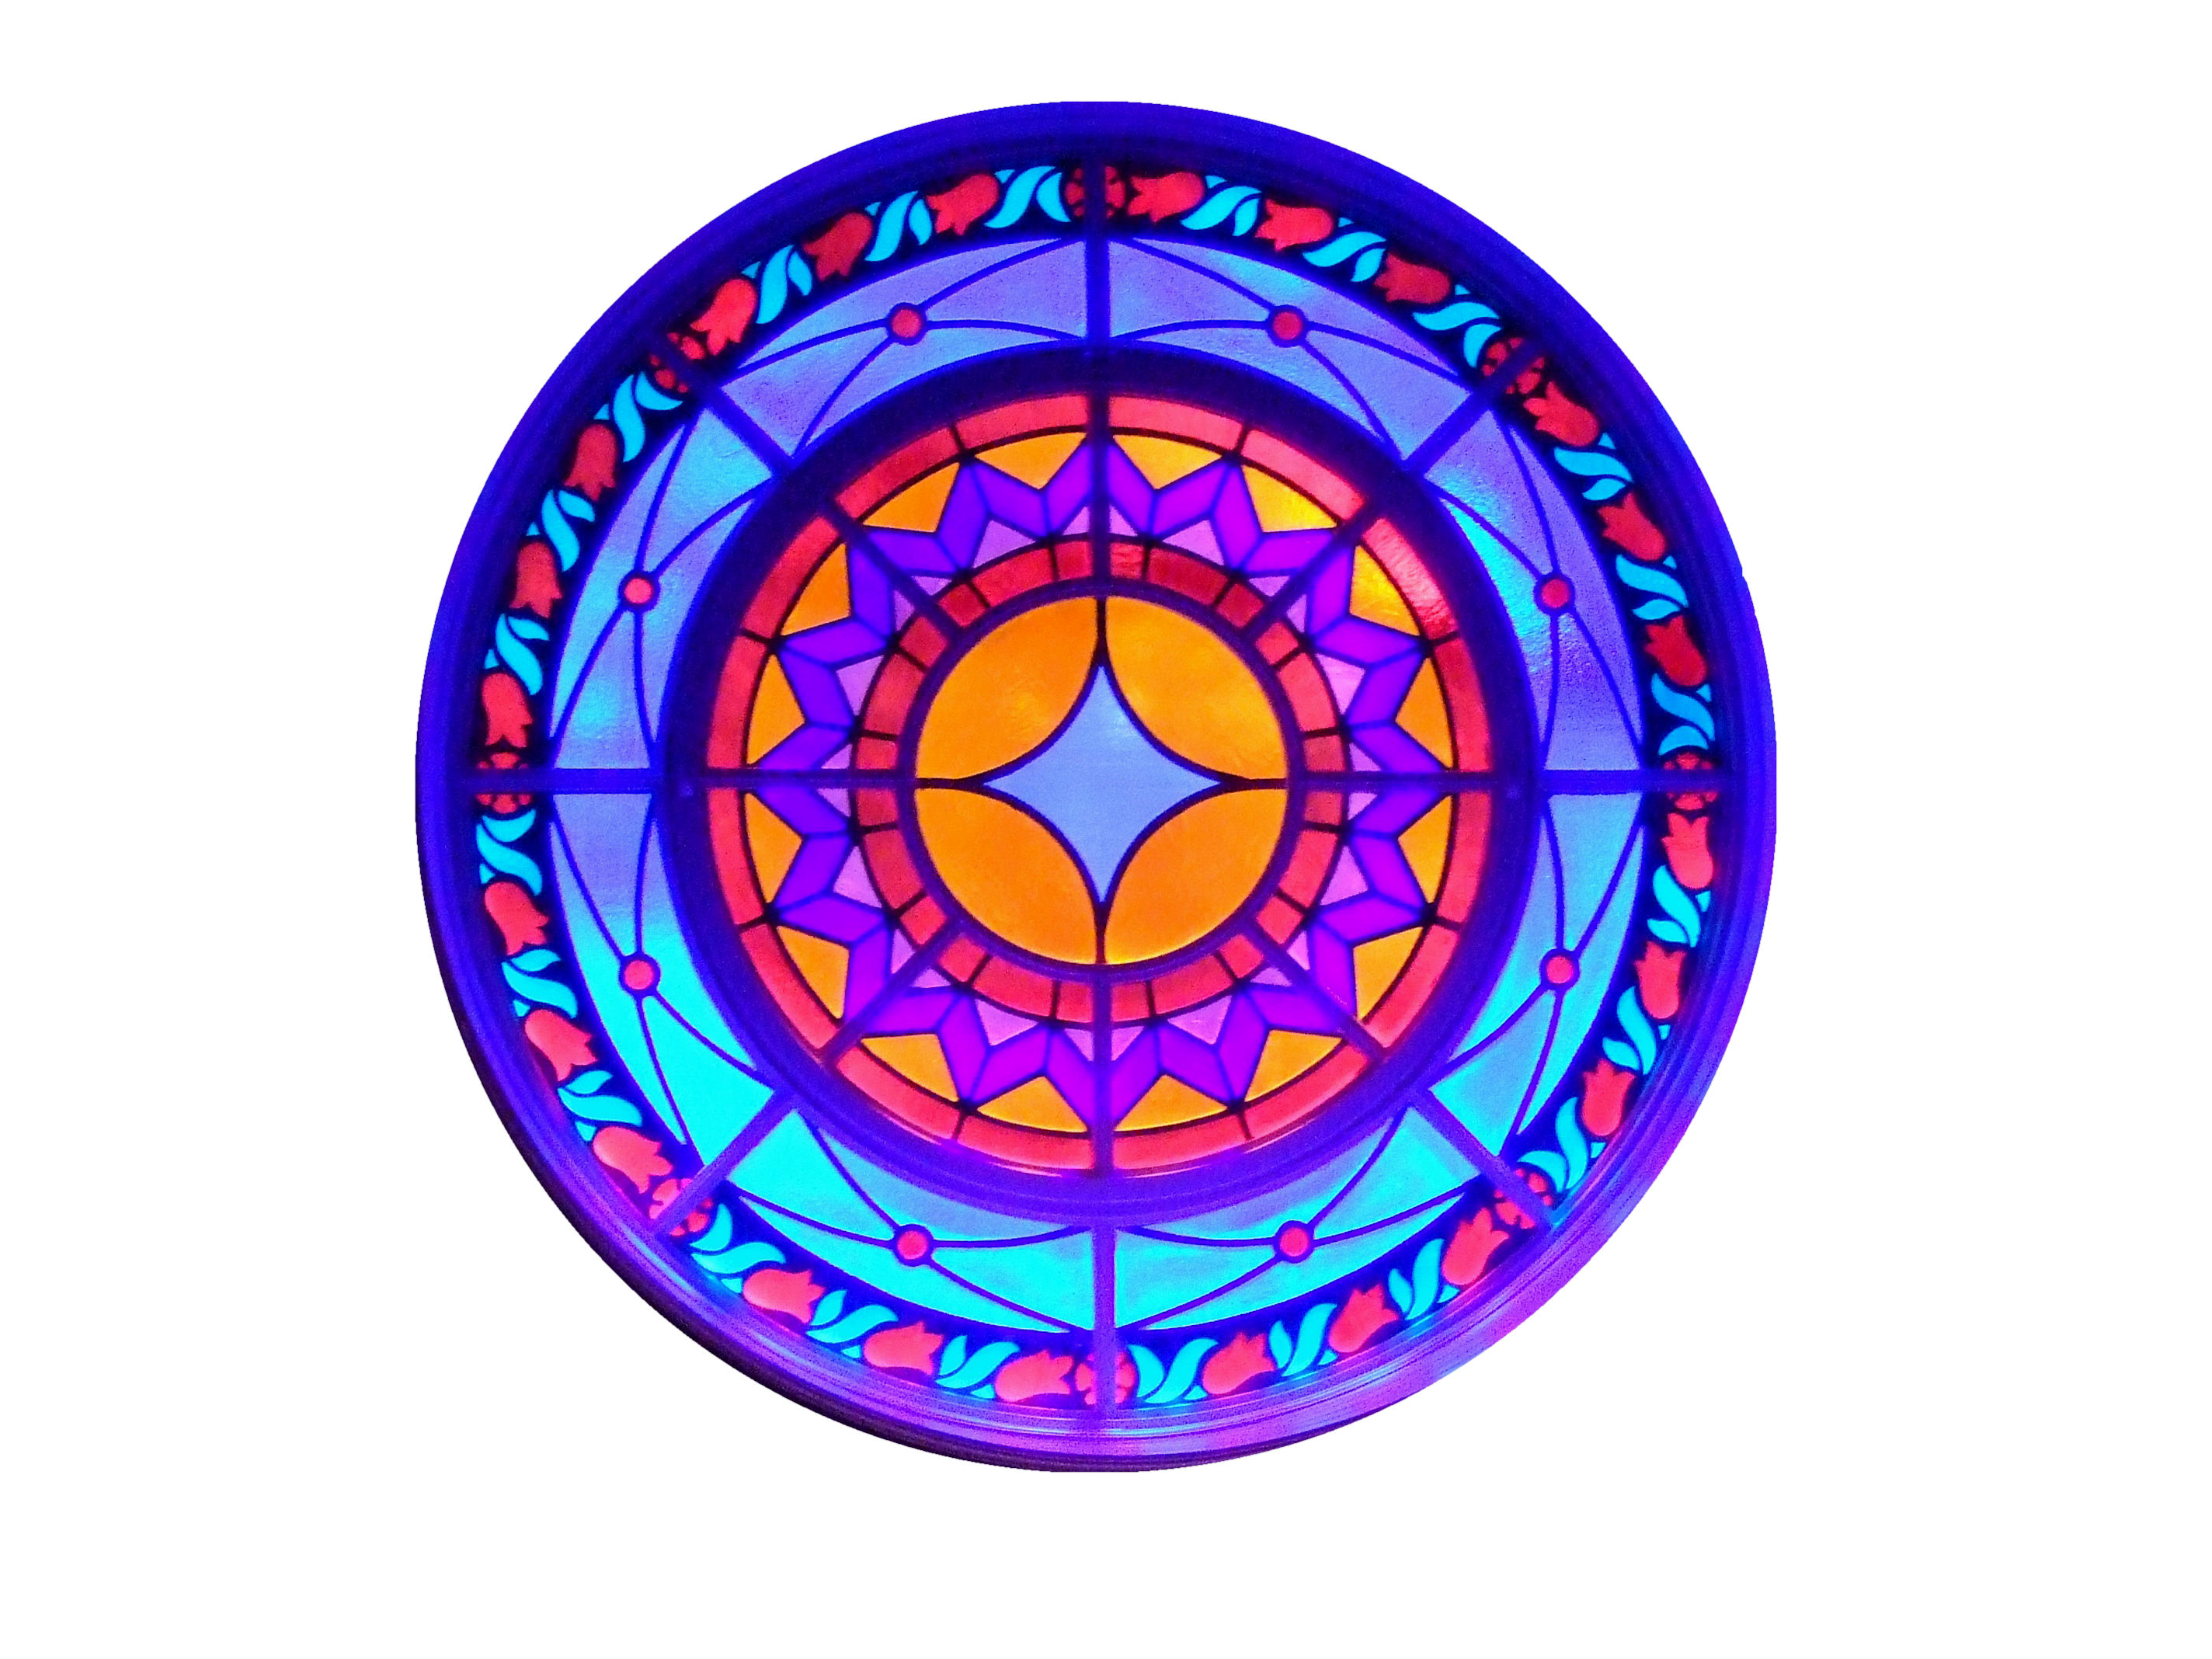 Round Stain Glass Window